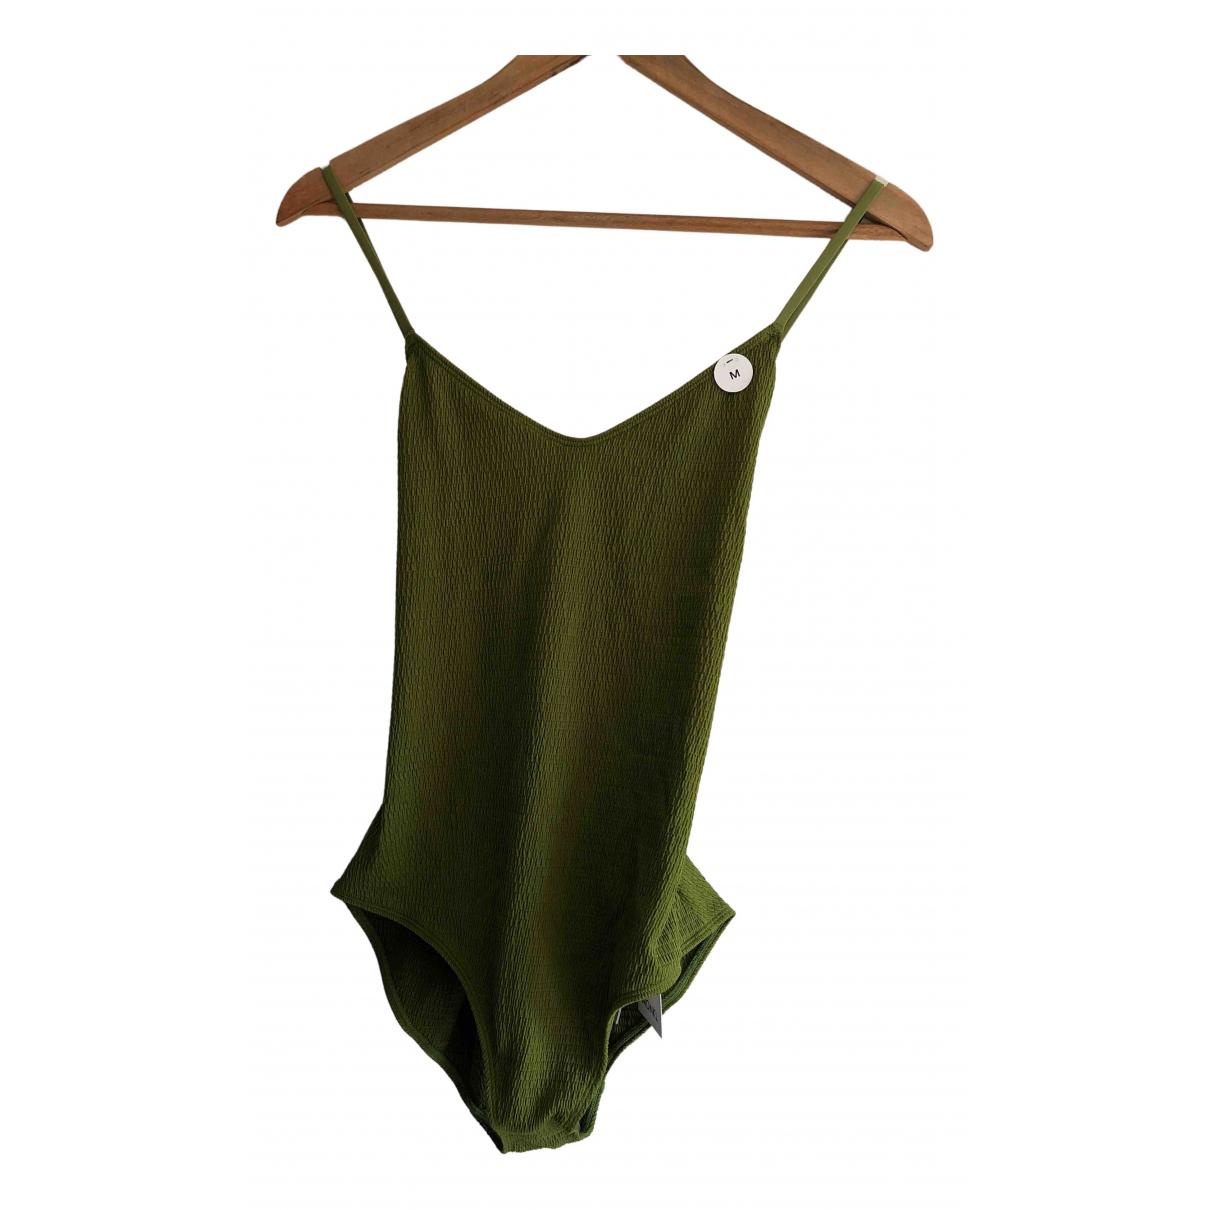 Monki \N Badeanzug in  Khaki Polyester